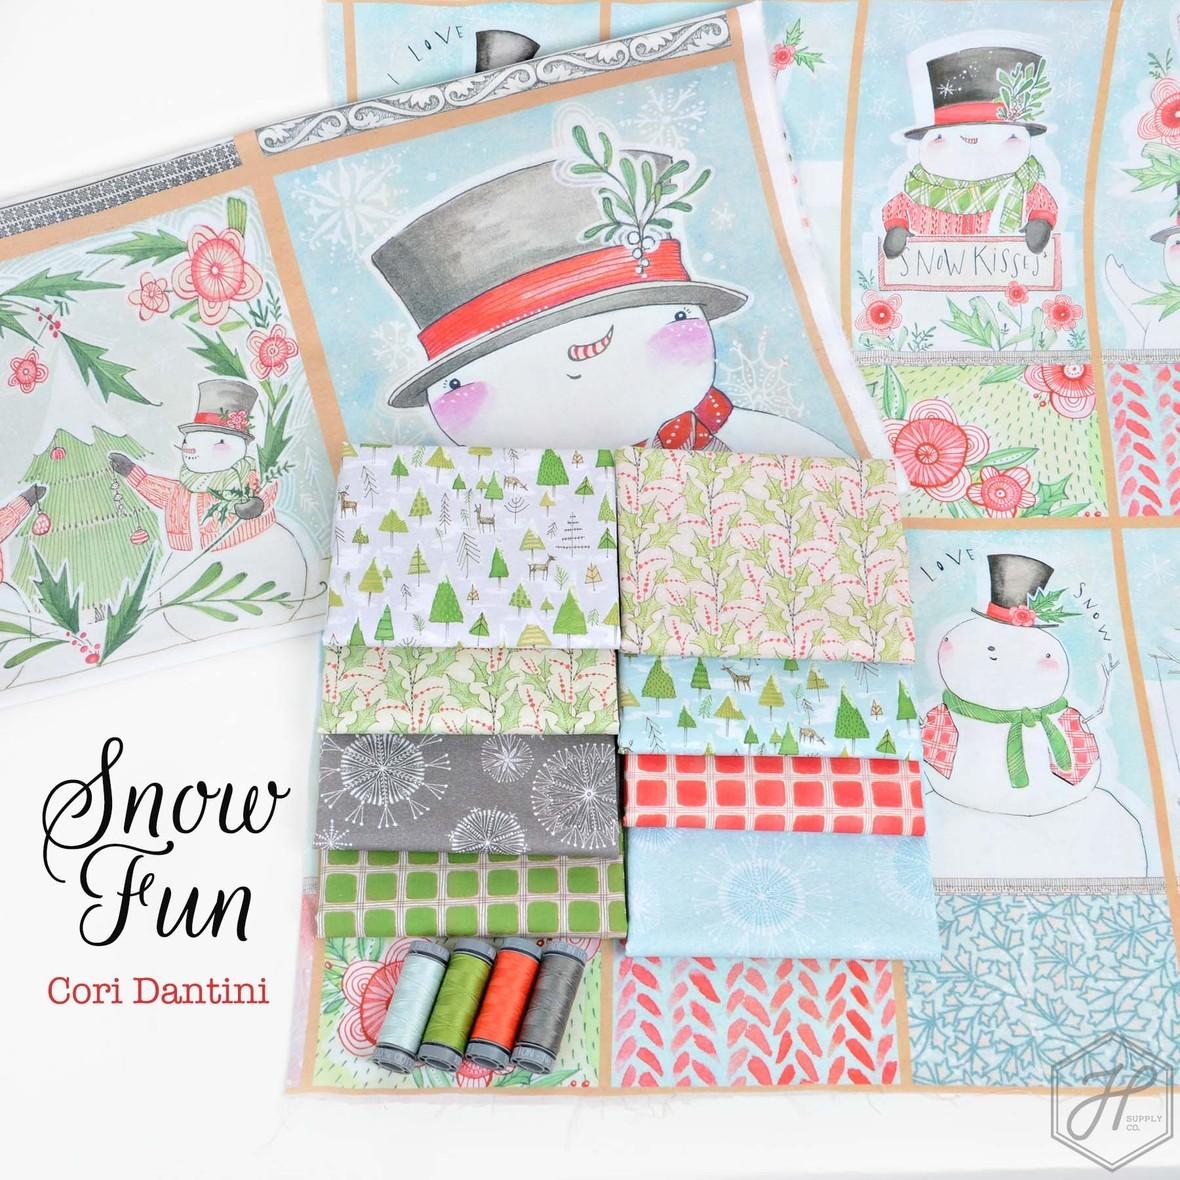 Snow Fun Fabric Poster Cori Dantini for Blend at Hawthorne Supply Co